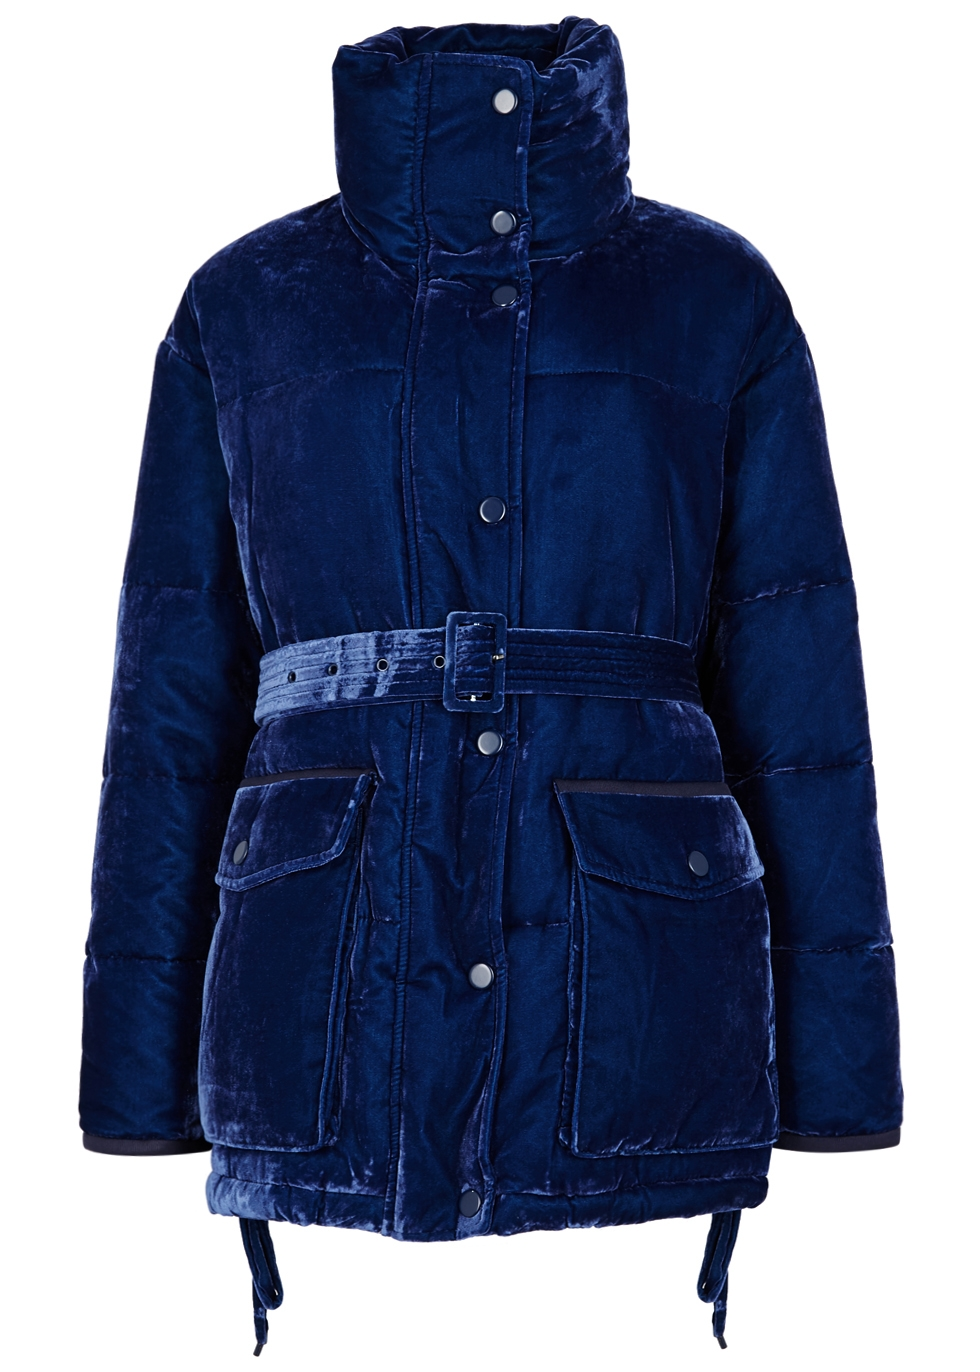 SJYP Blue Quilted Velvet Jacket in Dark Blue